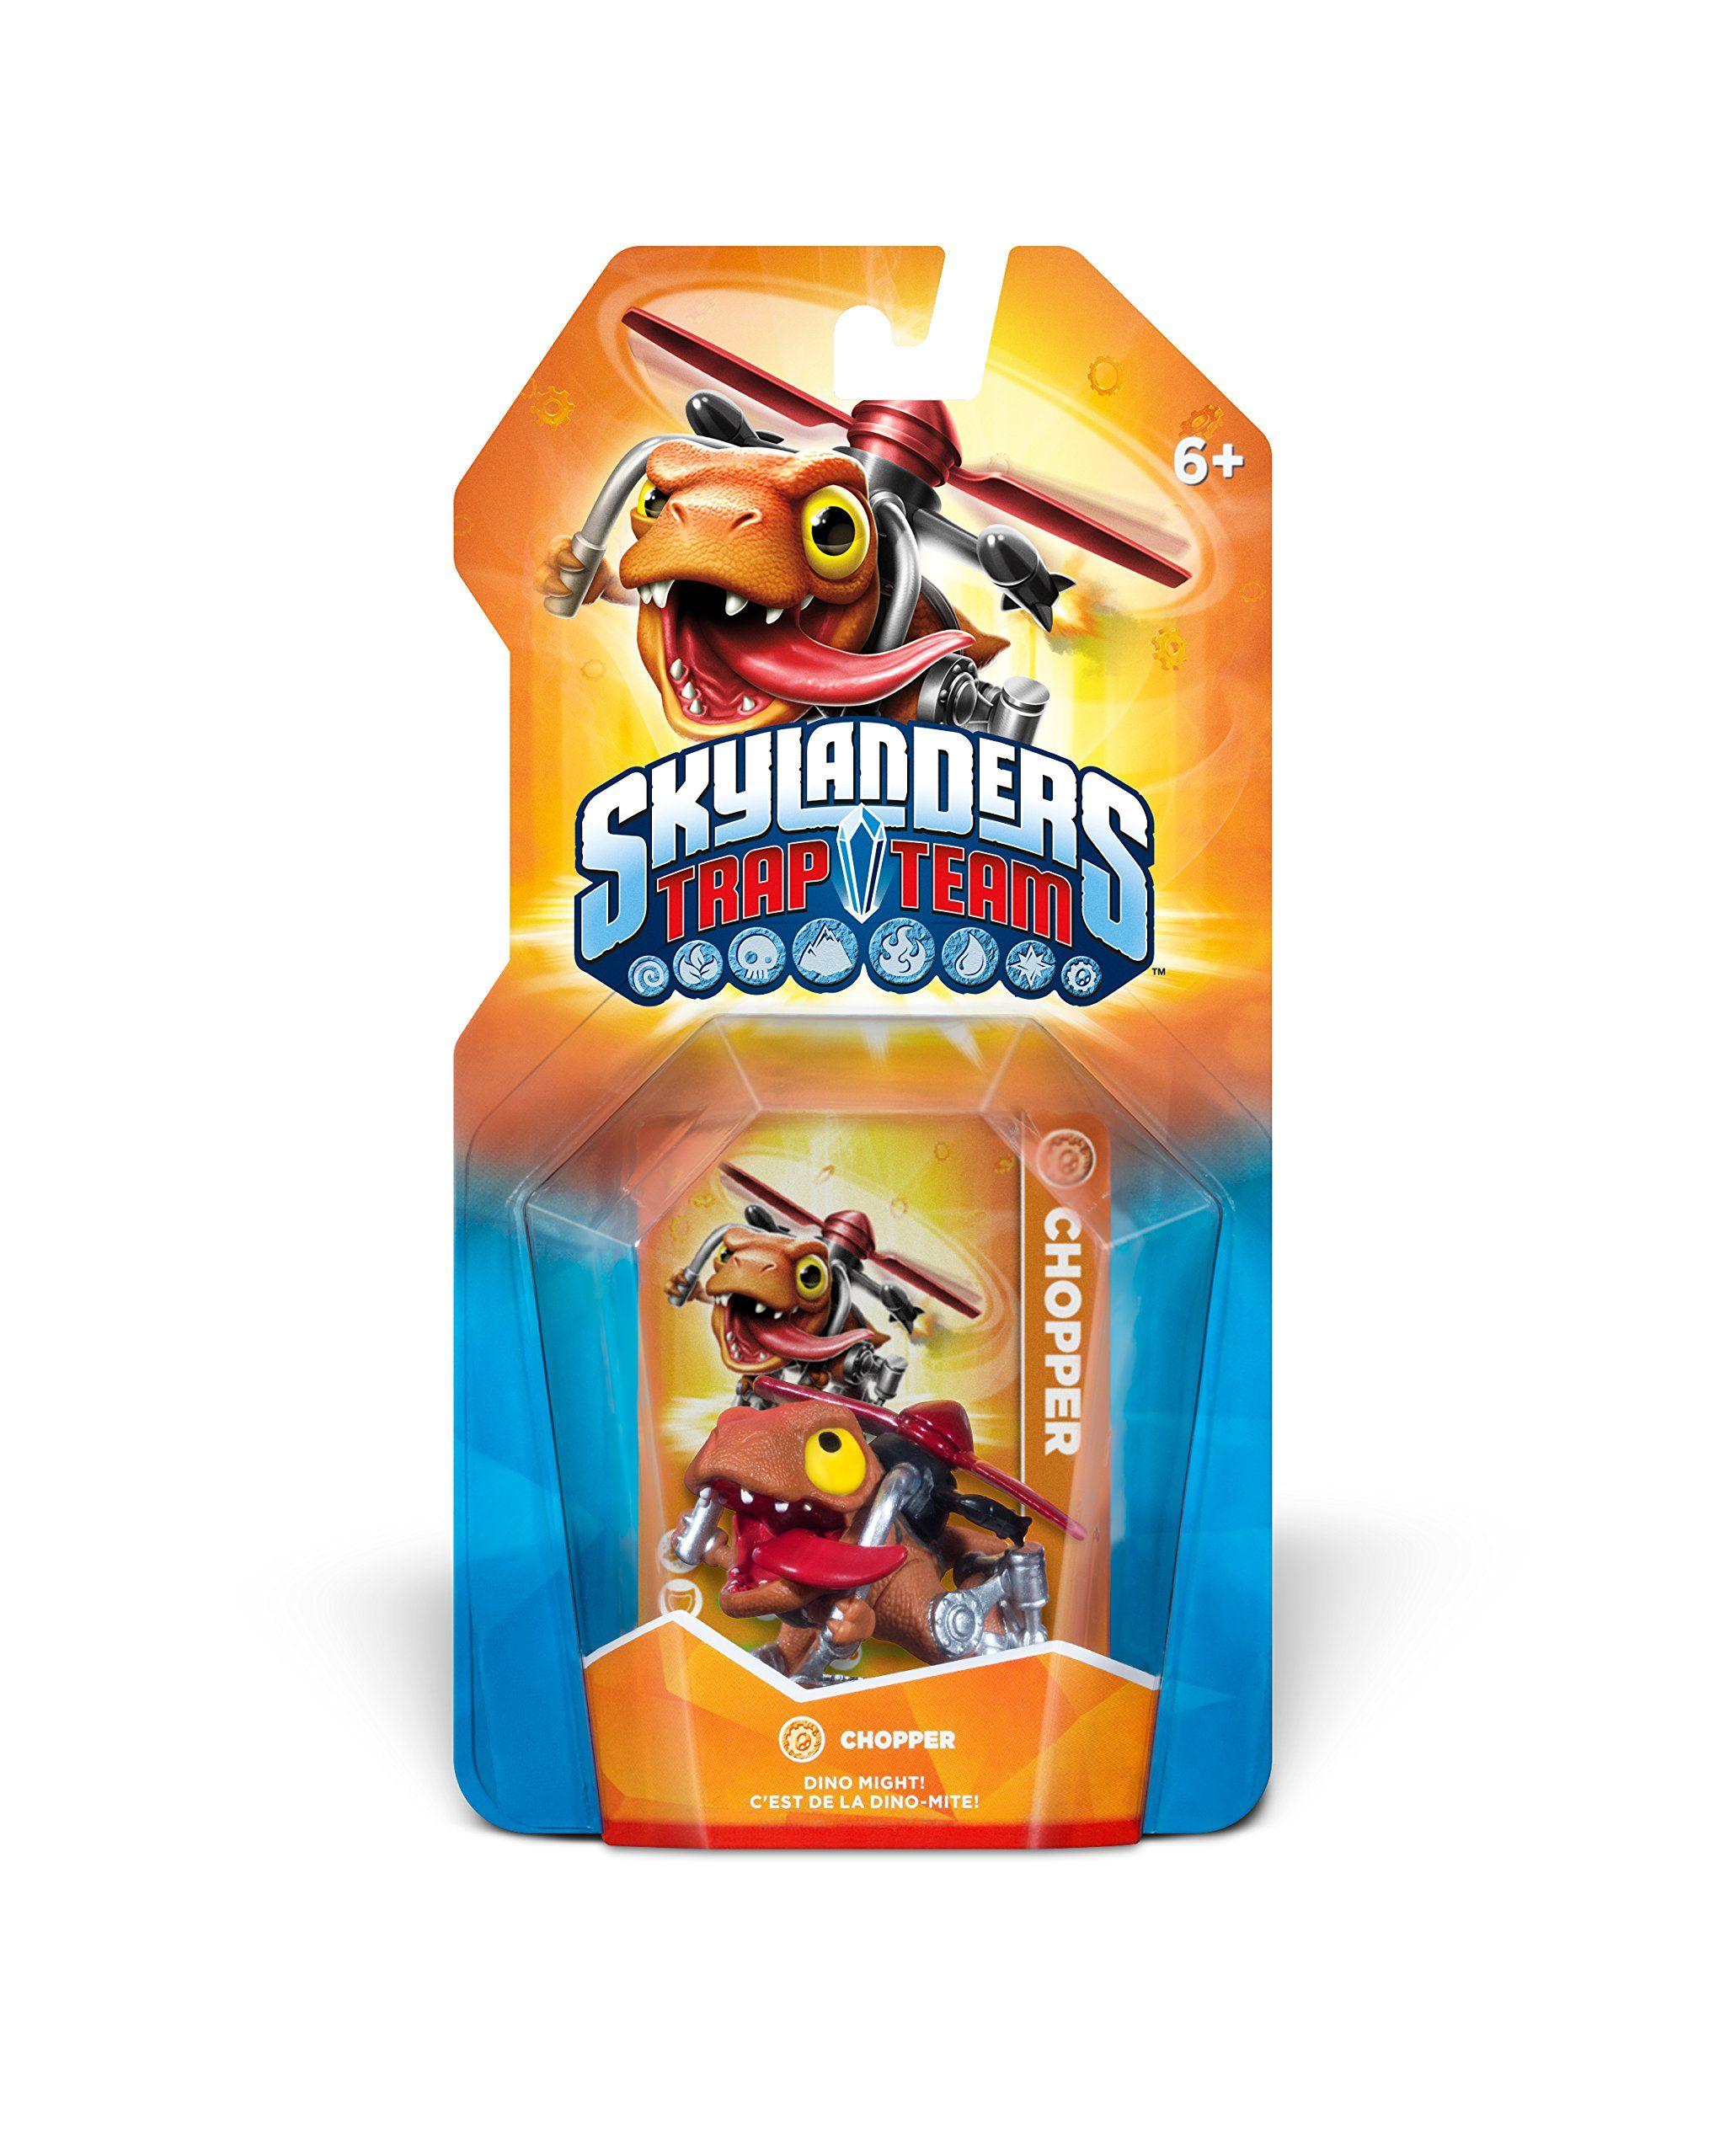 Amazon.com: Skylanders Trap Team: Chopper Character Pack: Video Games